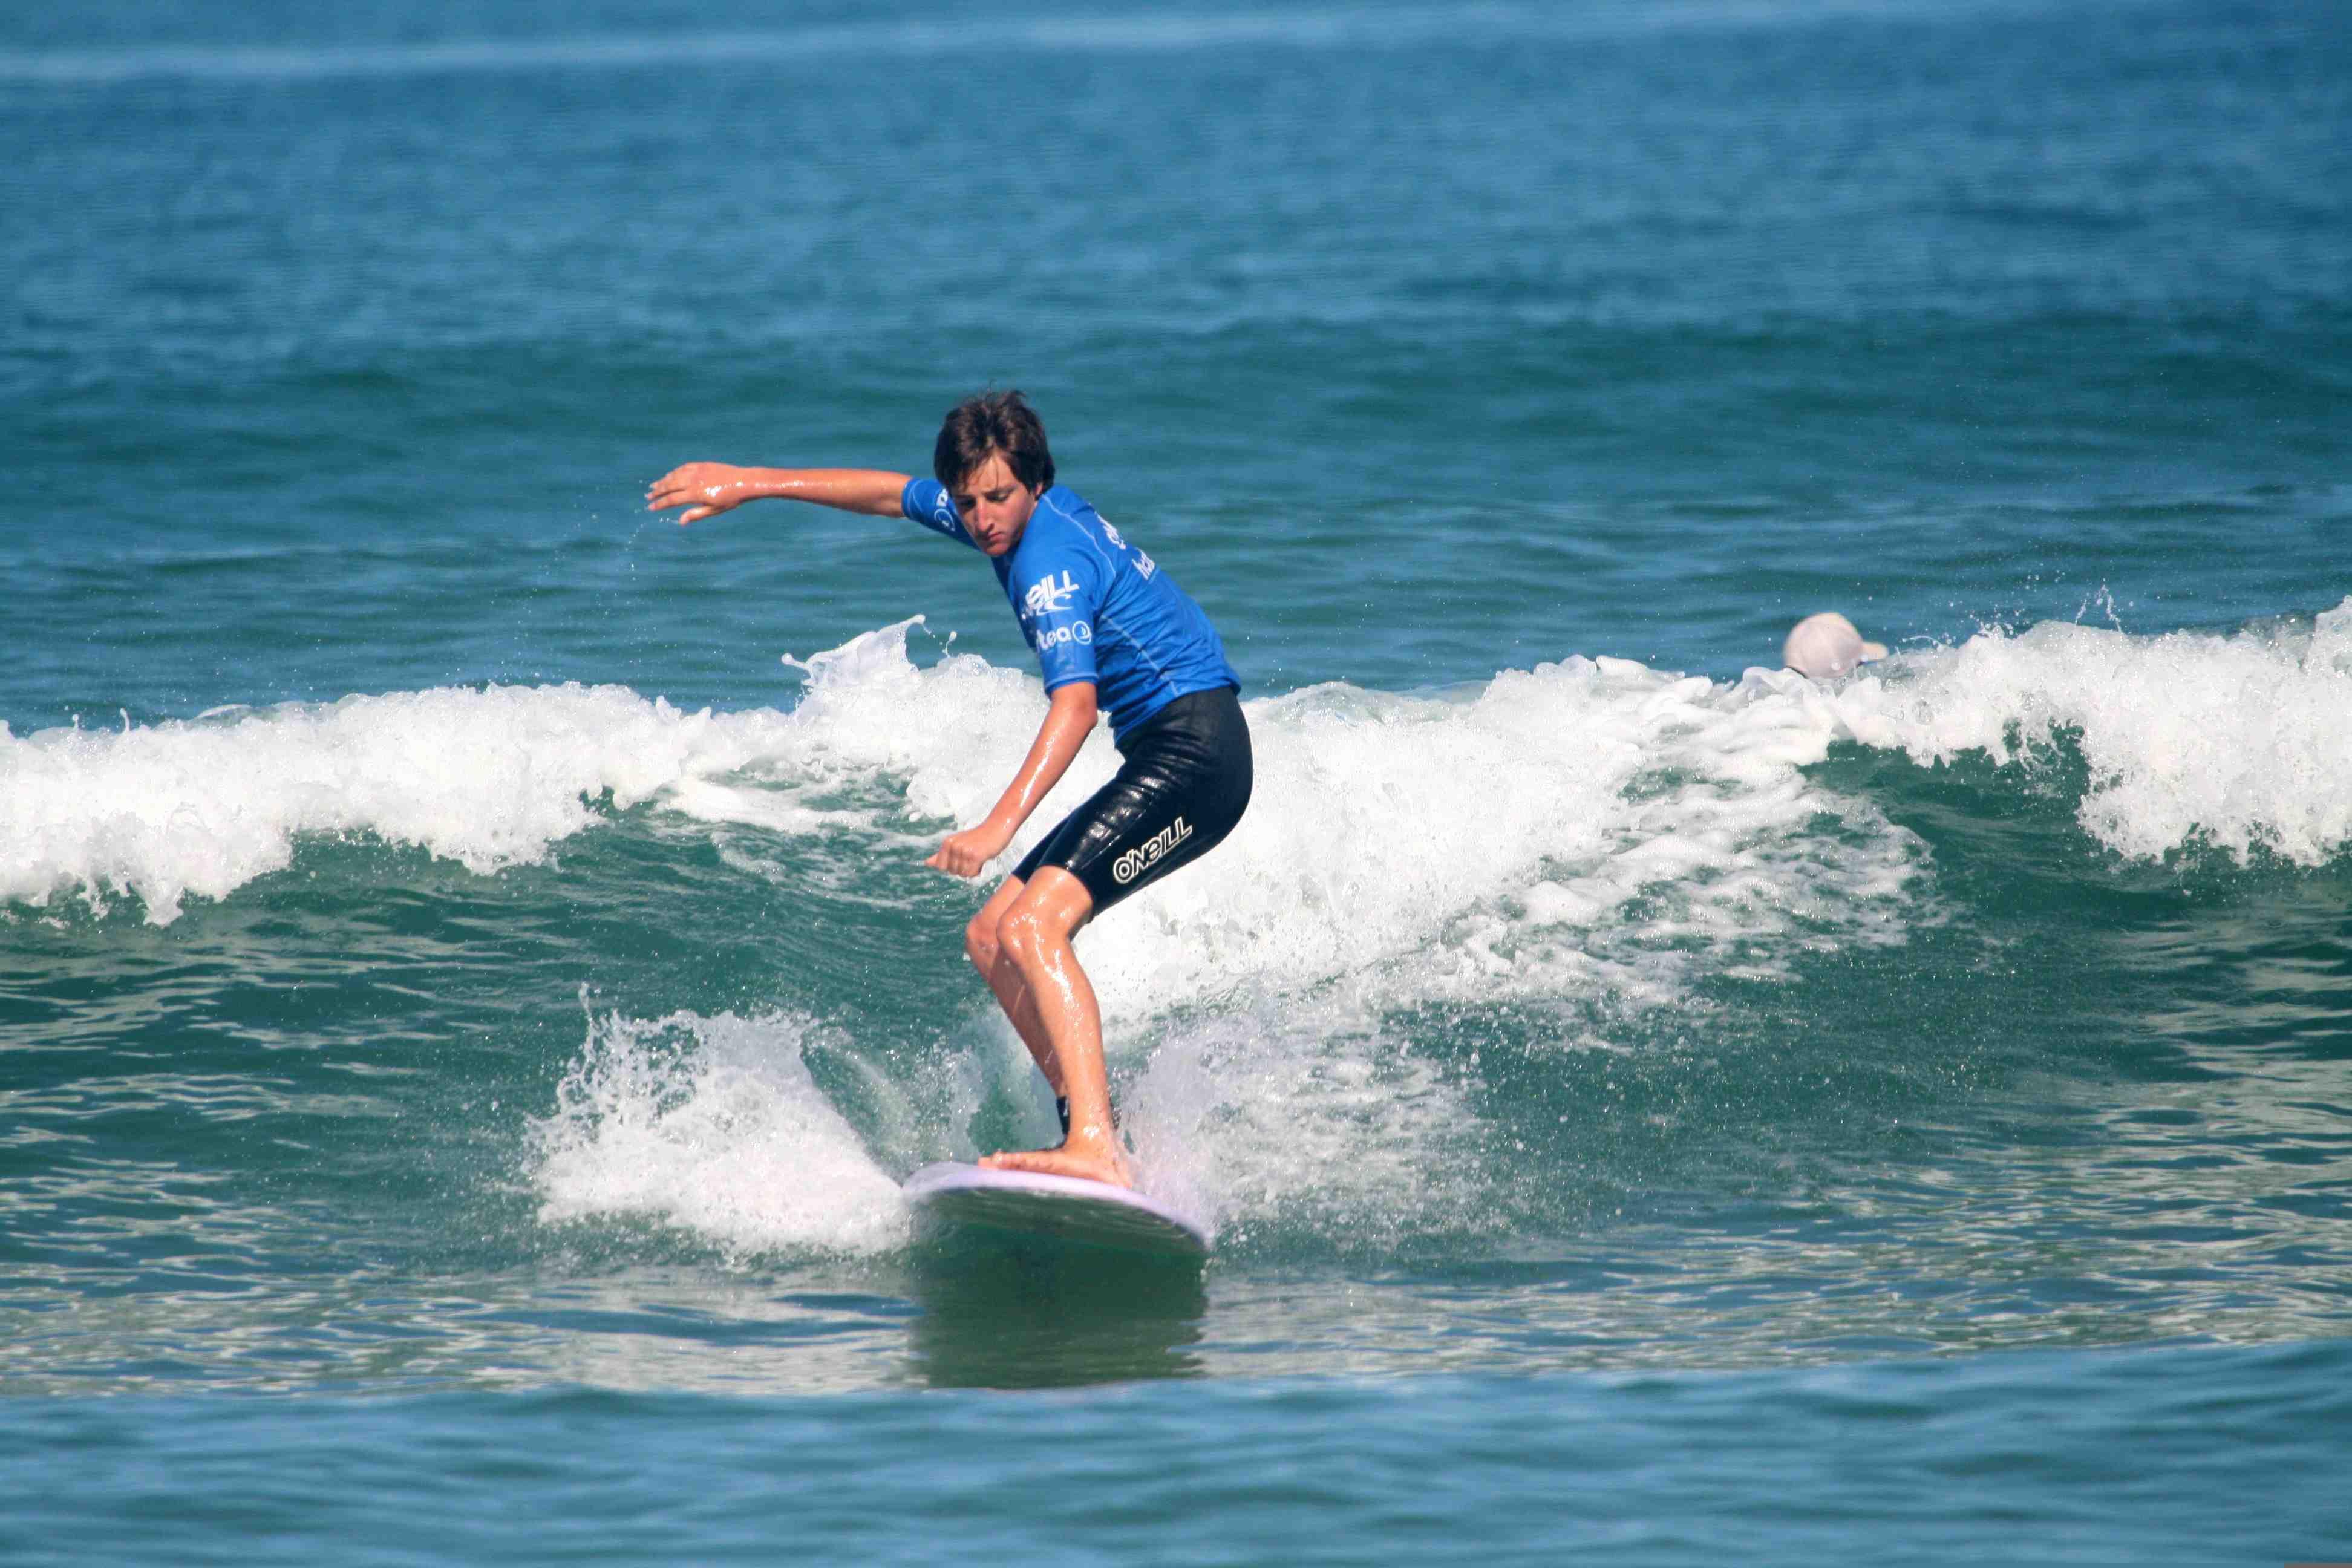 Nomad Surfers France